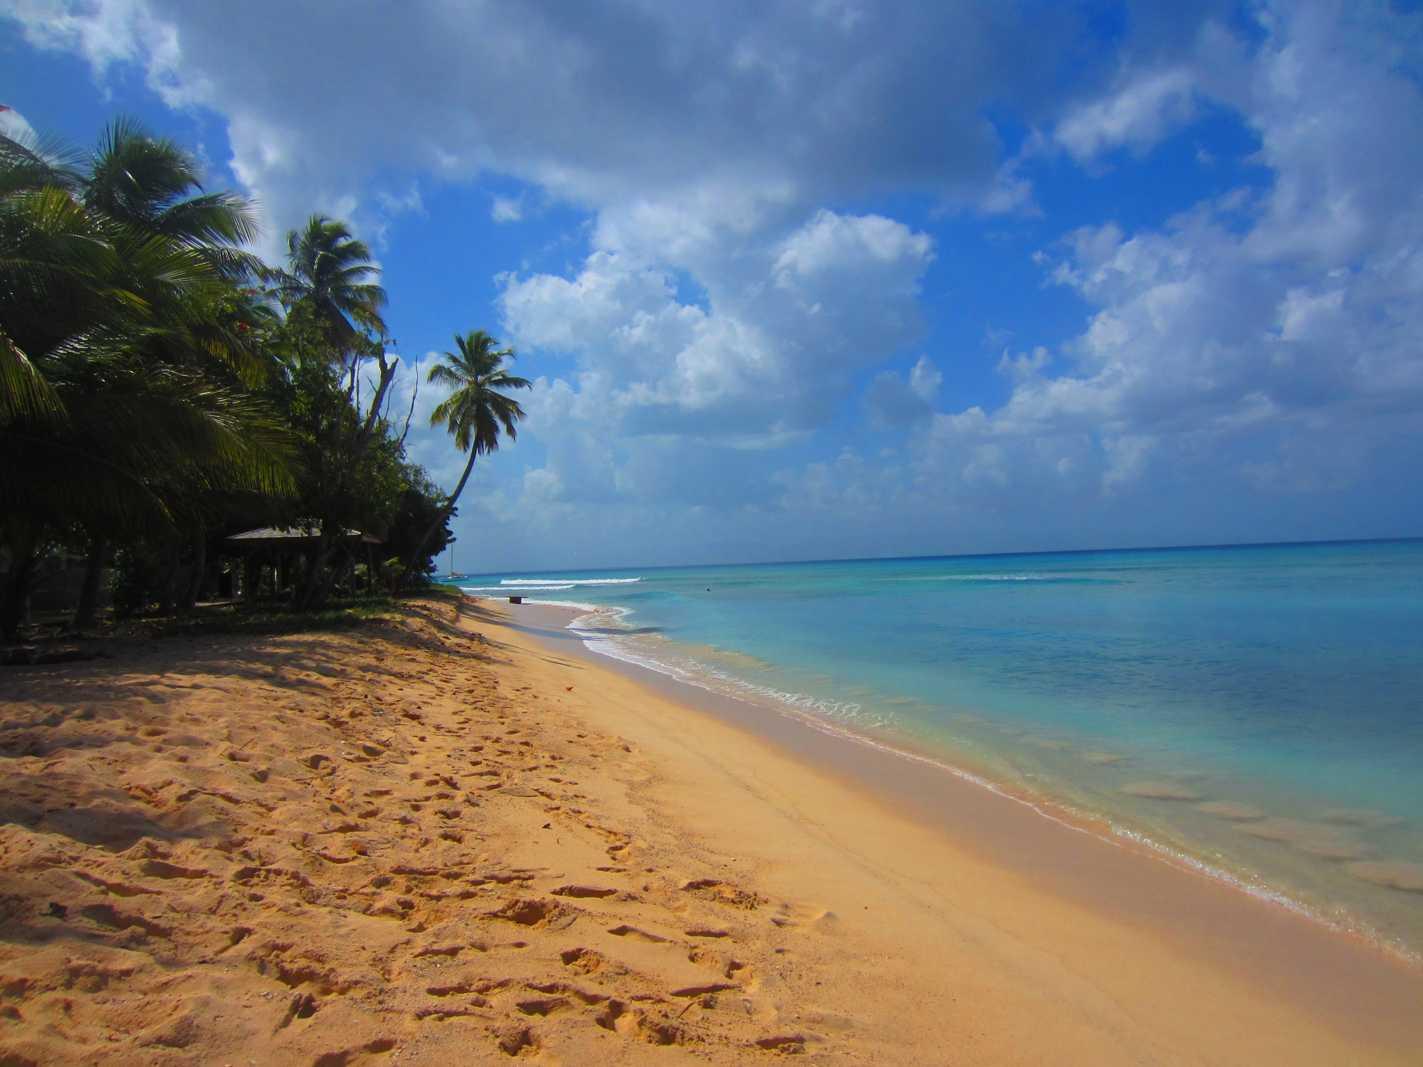 Plage Guadeloupe : Anse du Souffleur